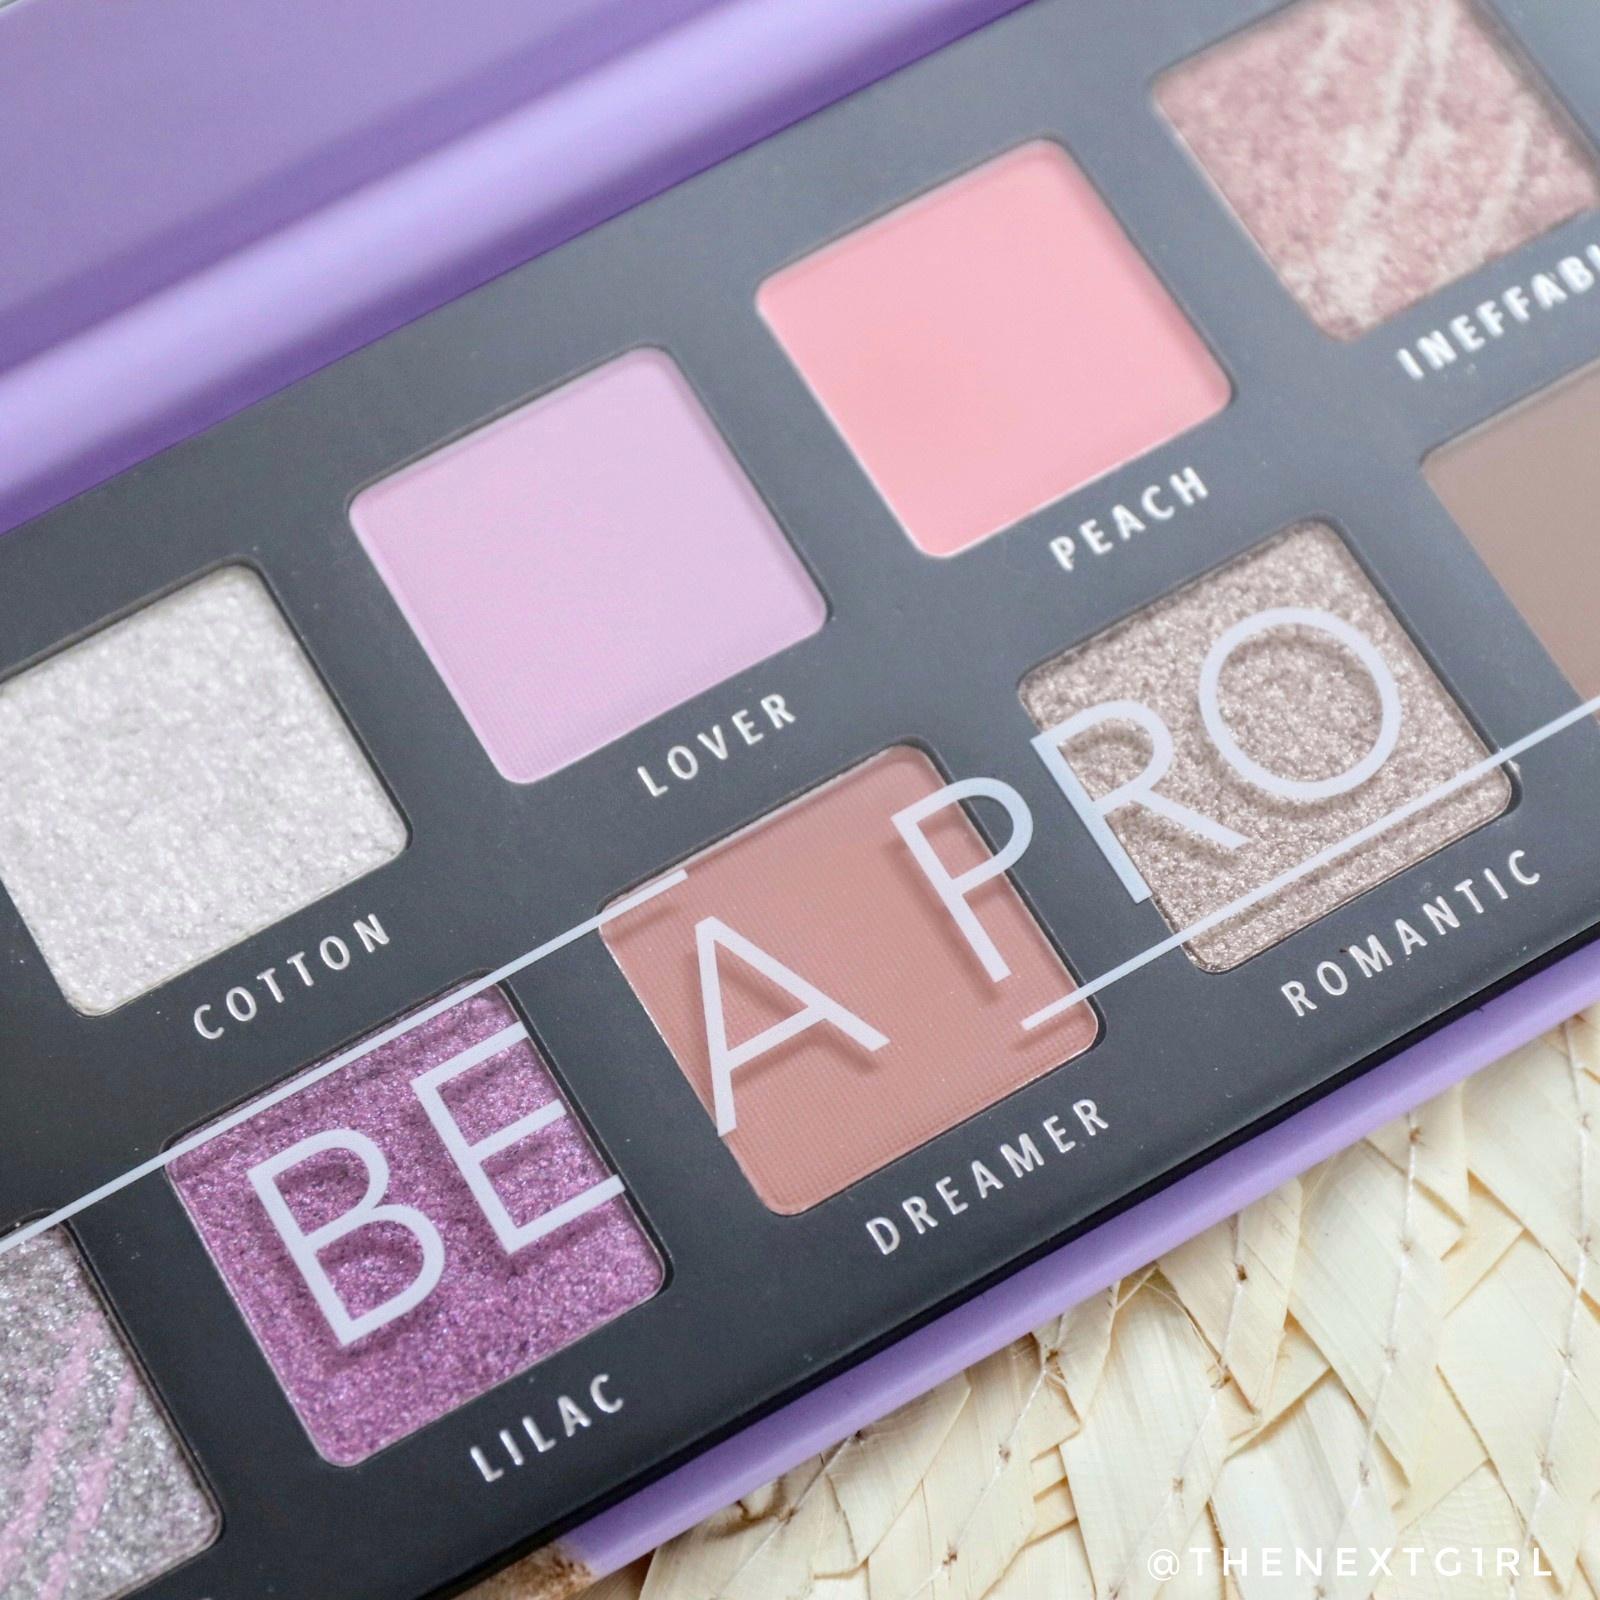 Review: Catrice PRO Lavender Breeze Slim eyeshadow palette